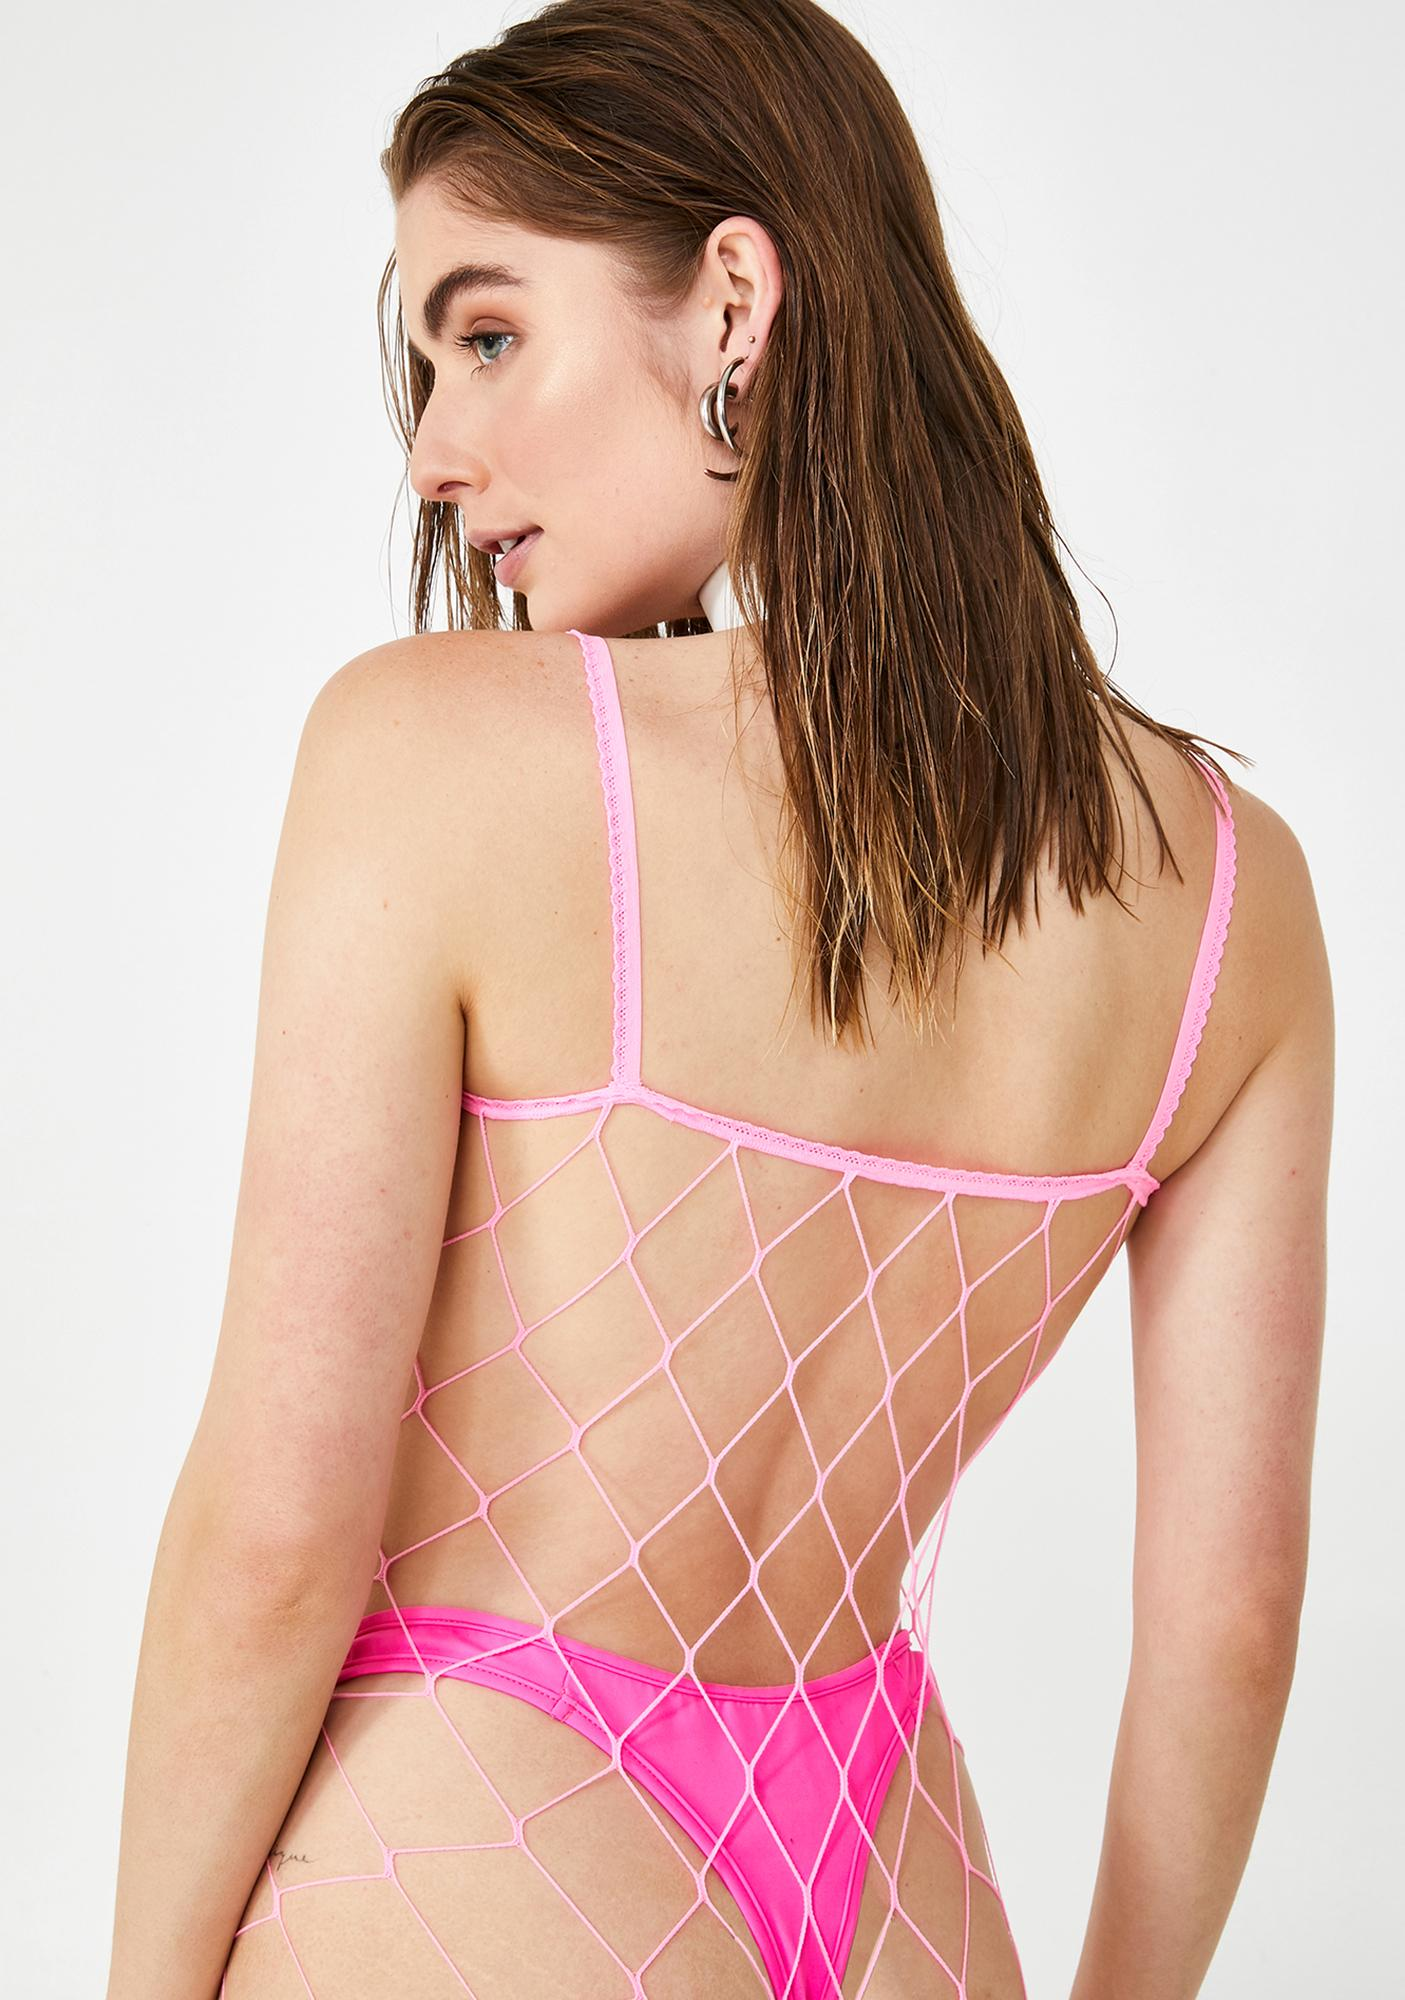 Miss Entice 'Em Fence Net Bodystocking